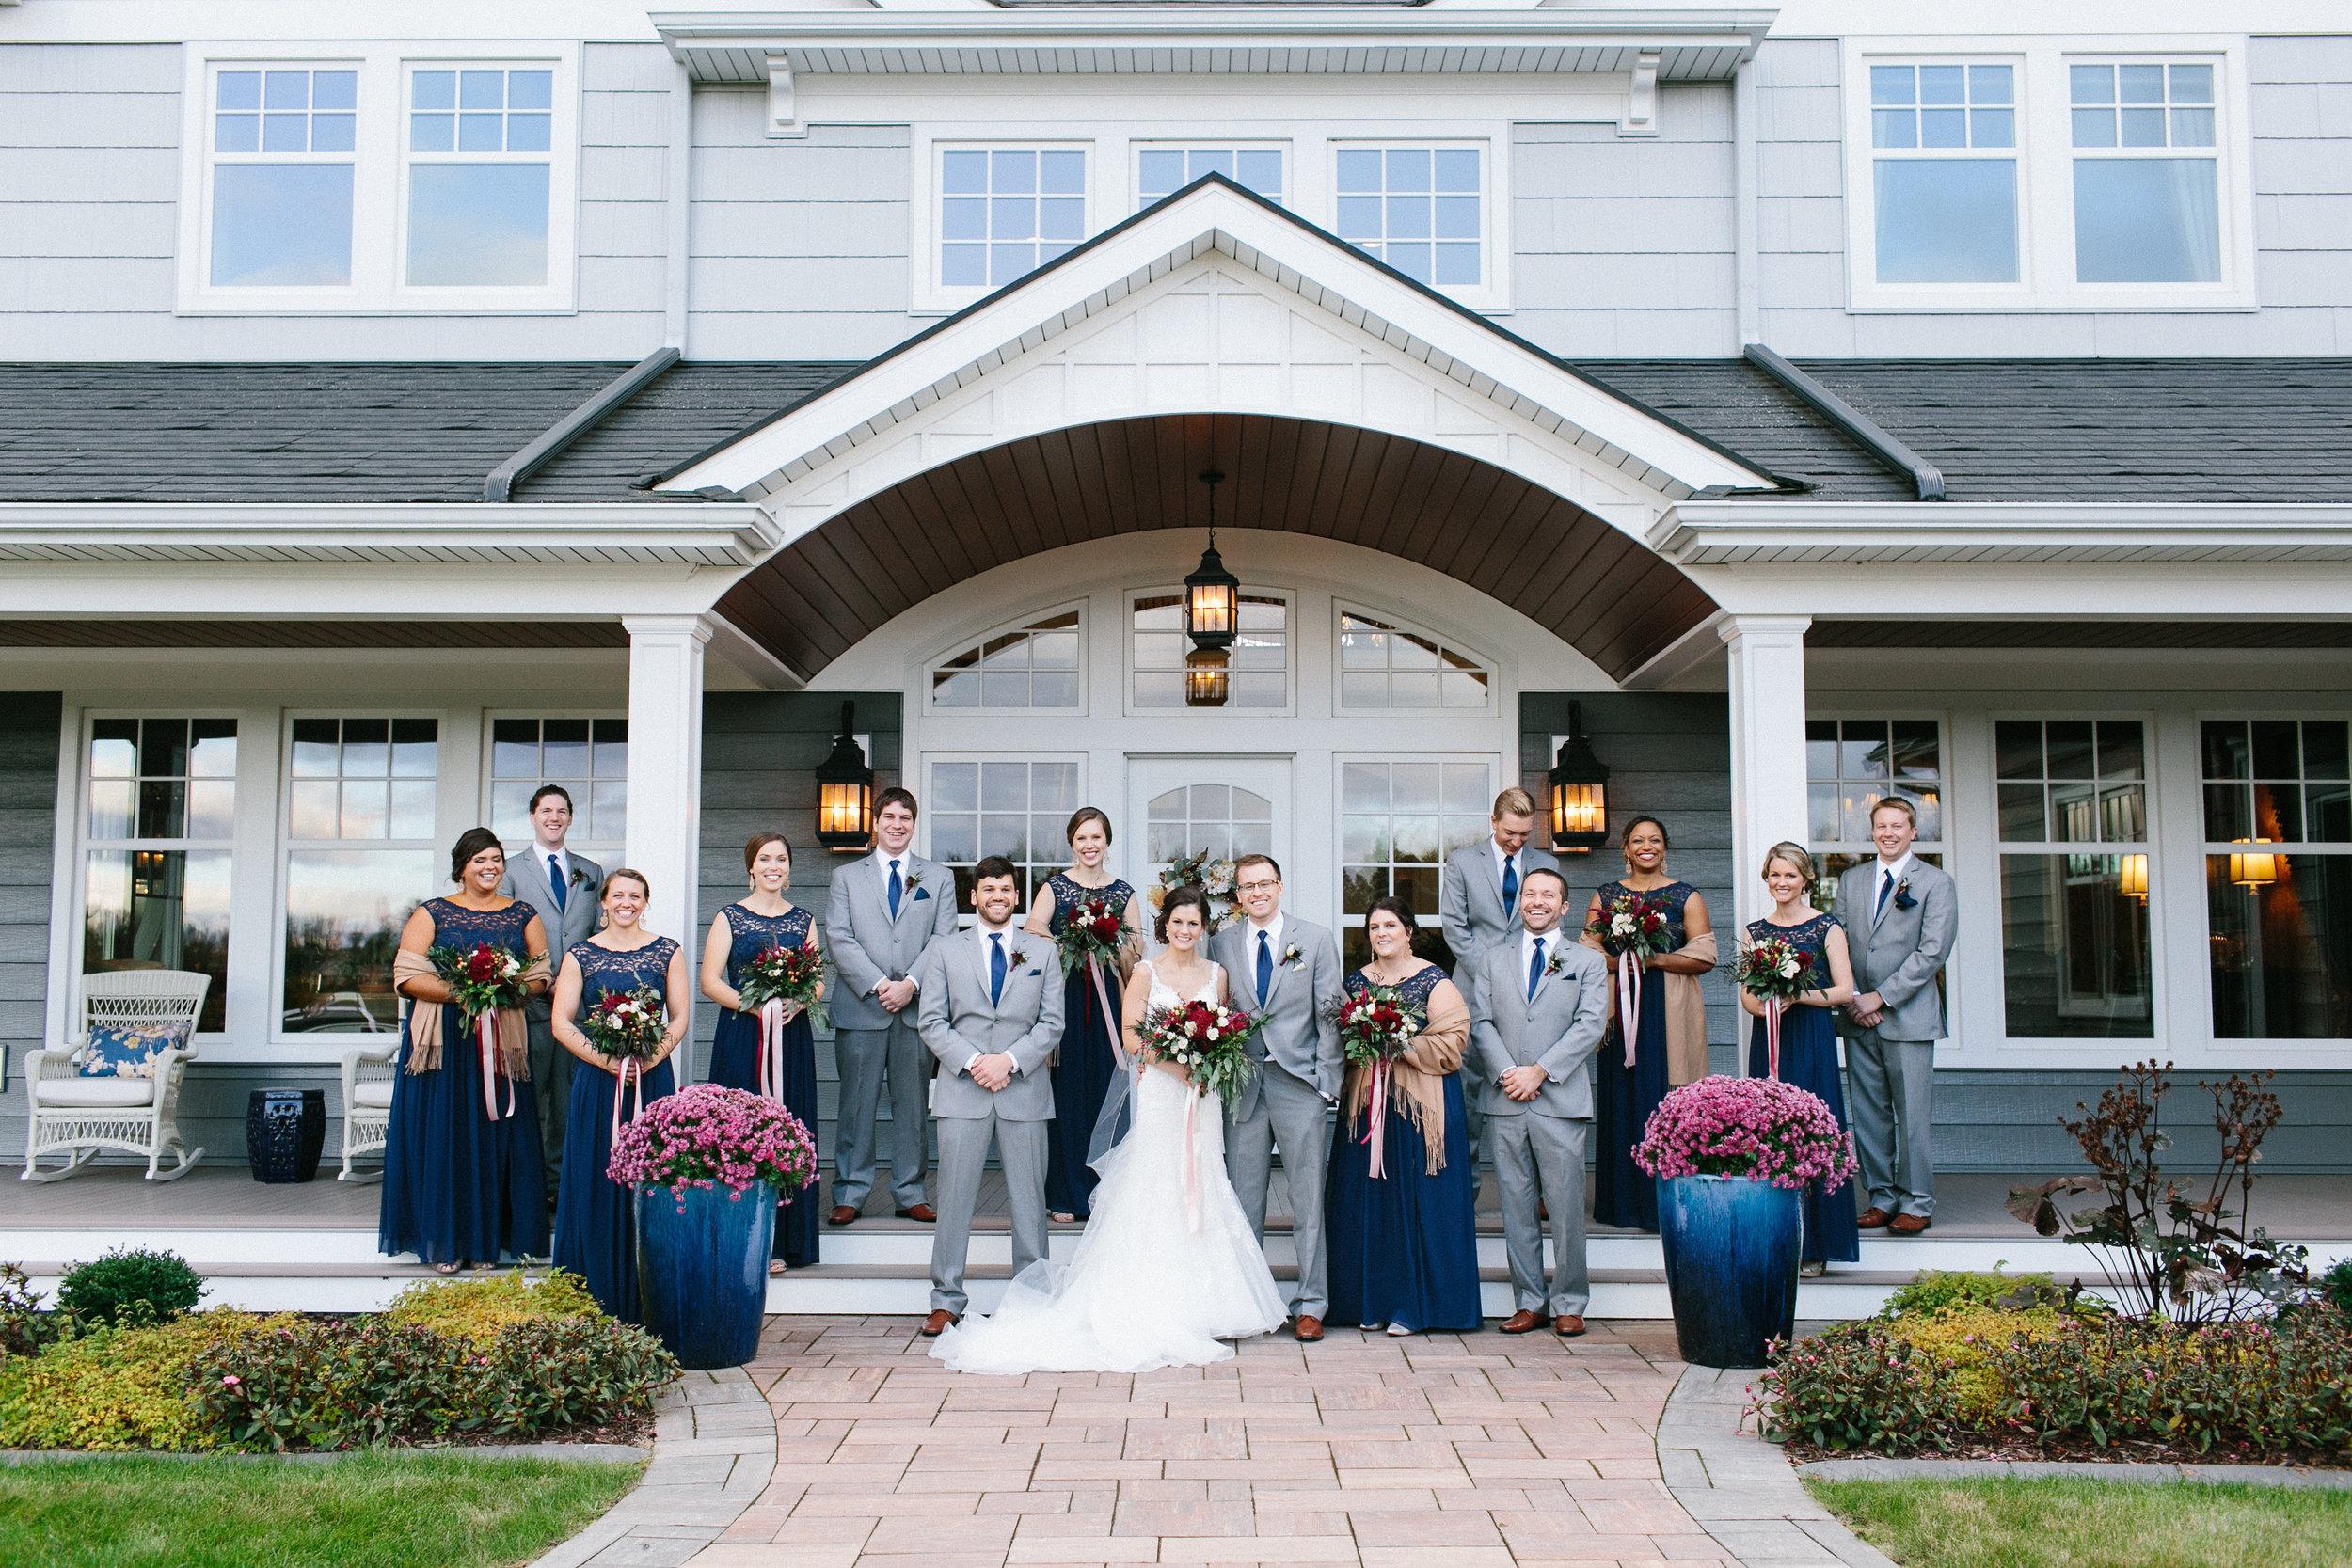 2017_Carly_Milbrath_Jefferson_Street_Inn_Wedding_Wausau_WI_334.JPG